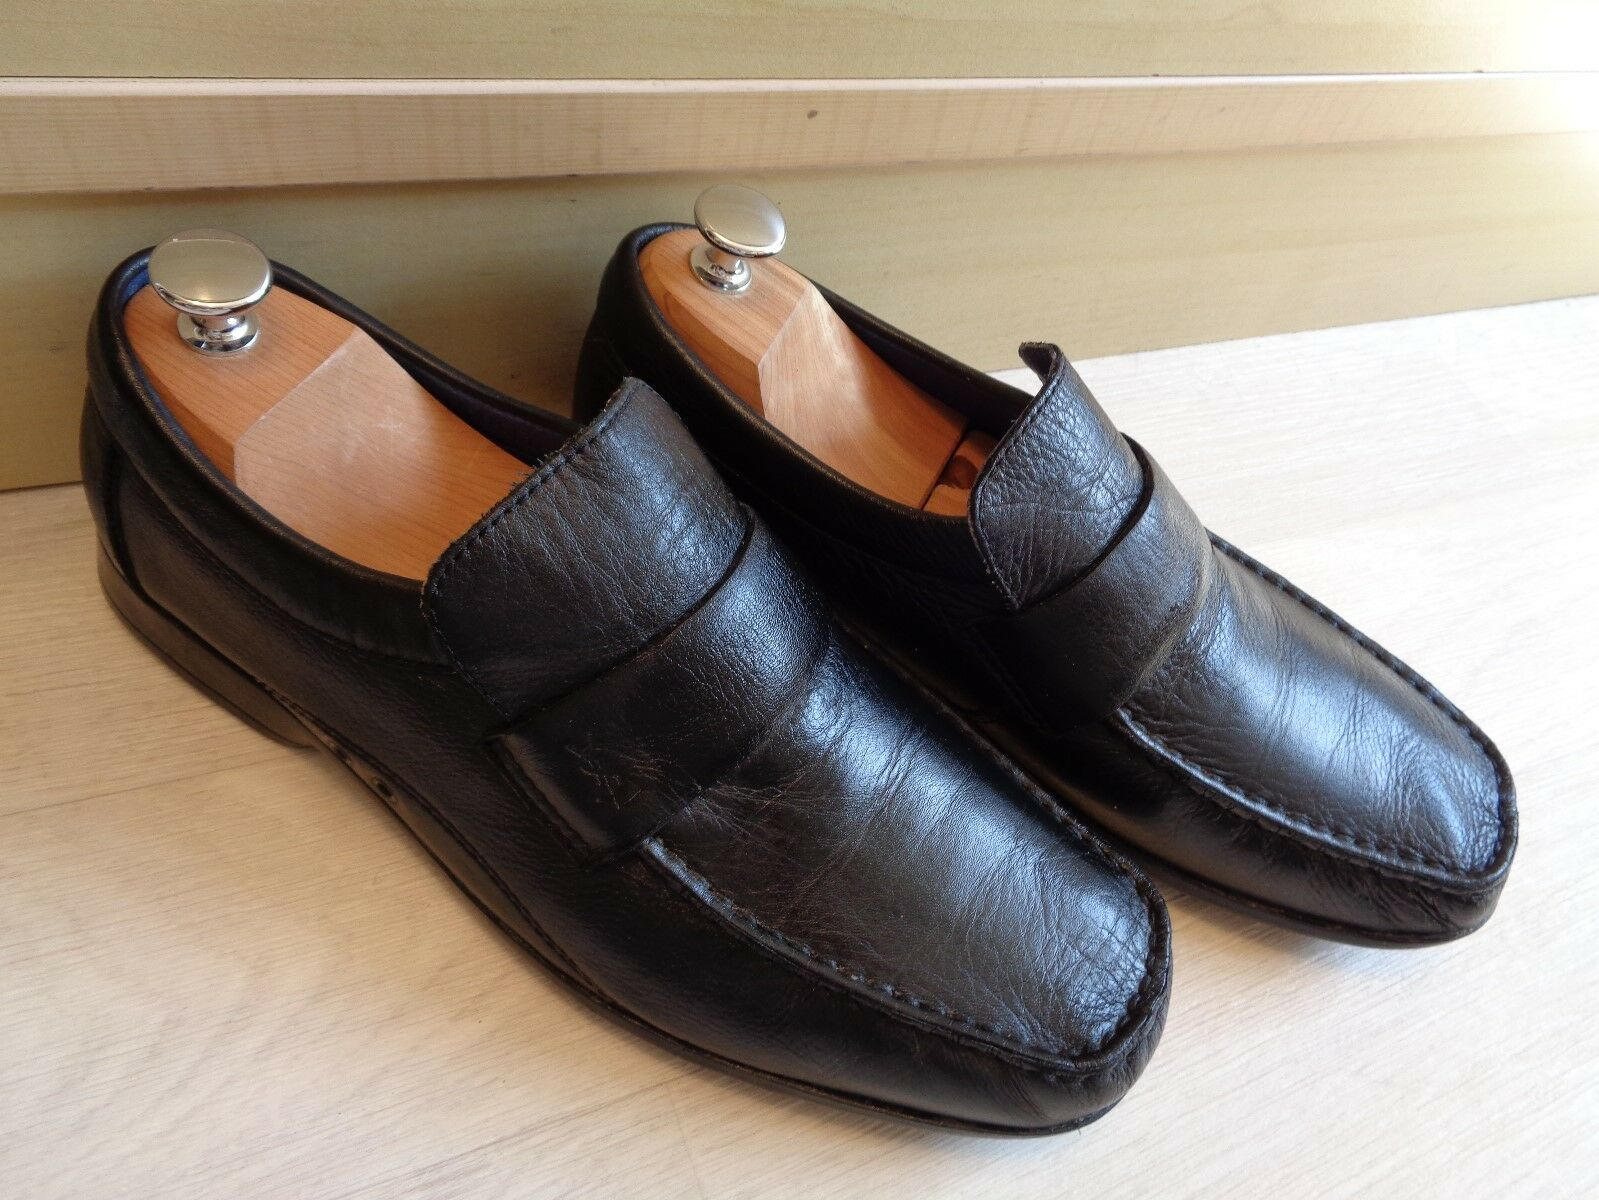 Yves Saint Laurent loafer UK 7 41 pour homme black leather sq toe strap moccasin